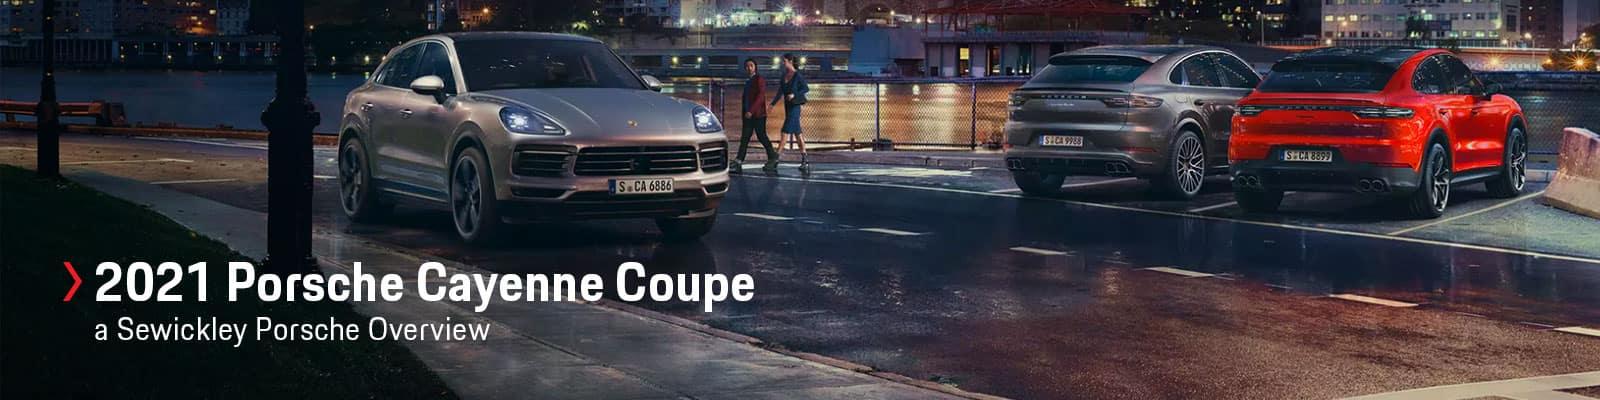 2021 Porsche Cayenne Coupe Model Overview at Sewickley Porsche